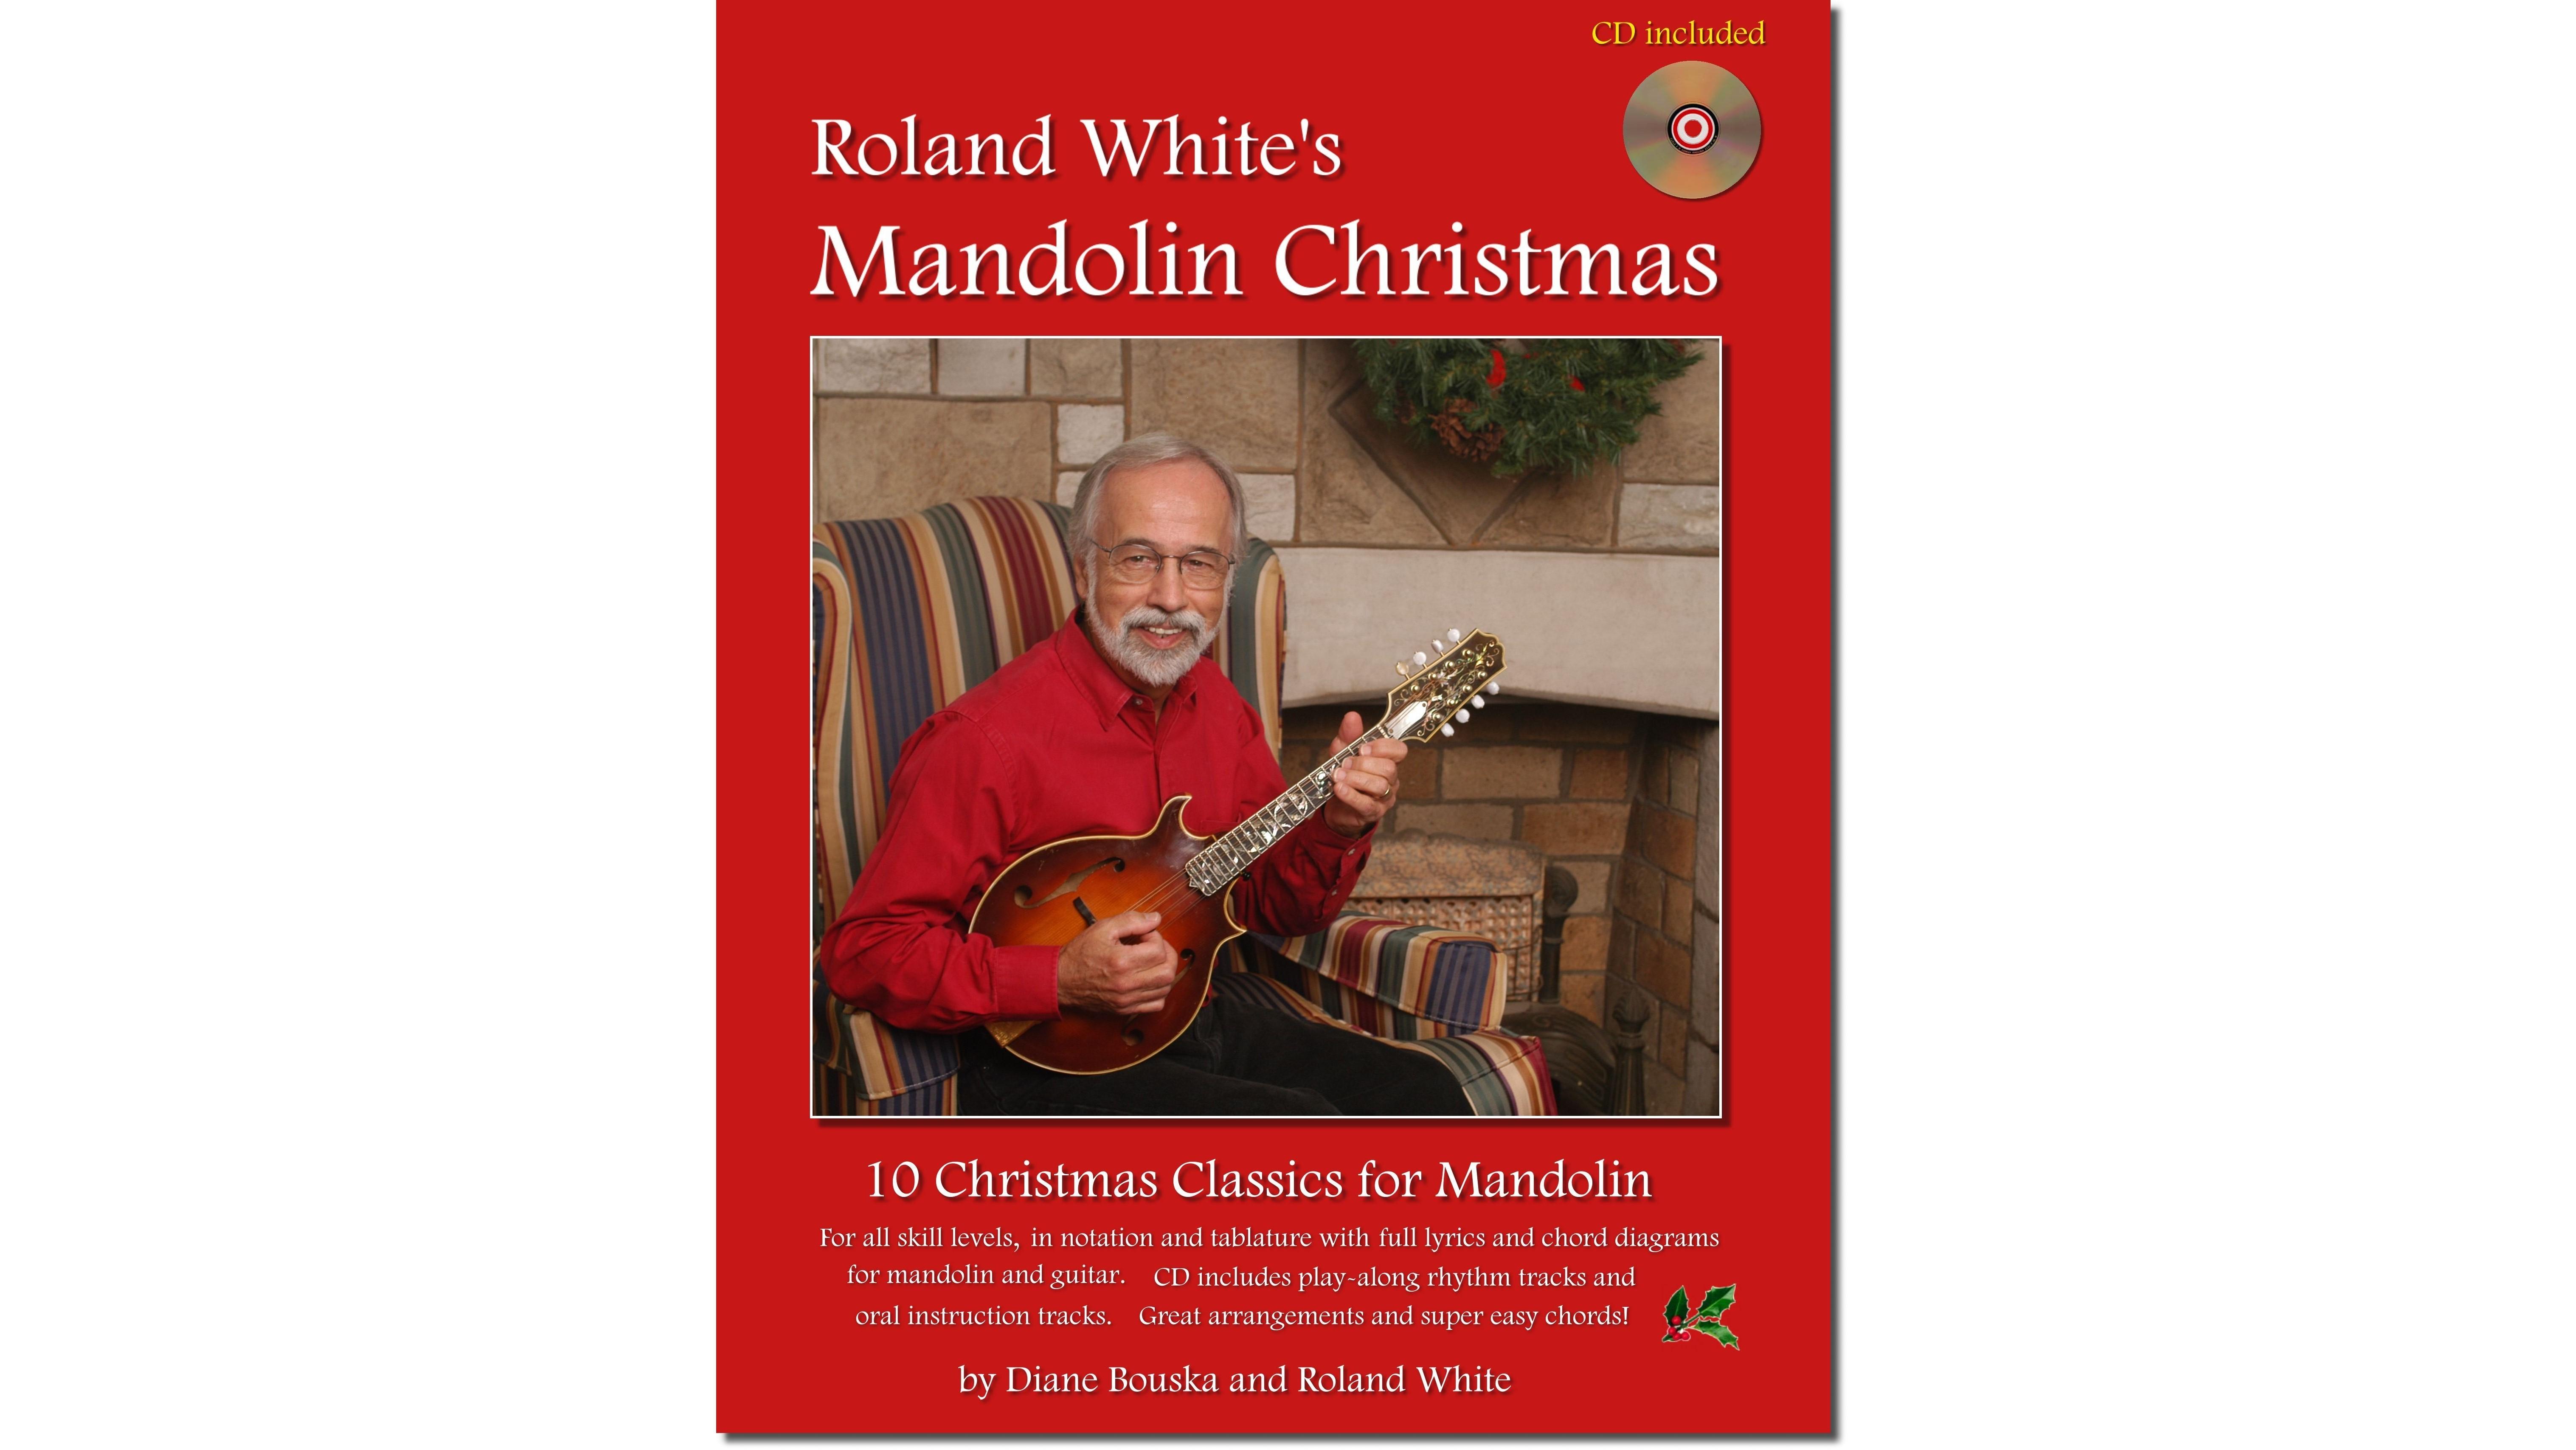 Roland Whites Bluegrass Mandolin Cds And Instruction Books